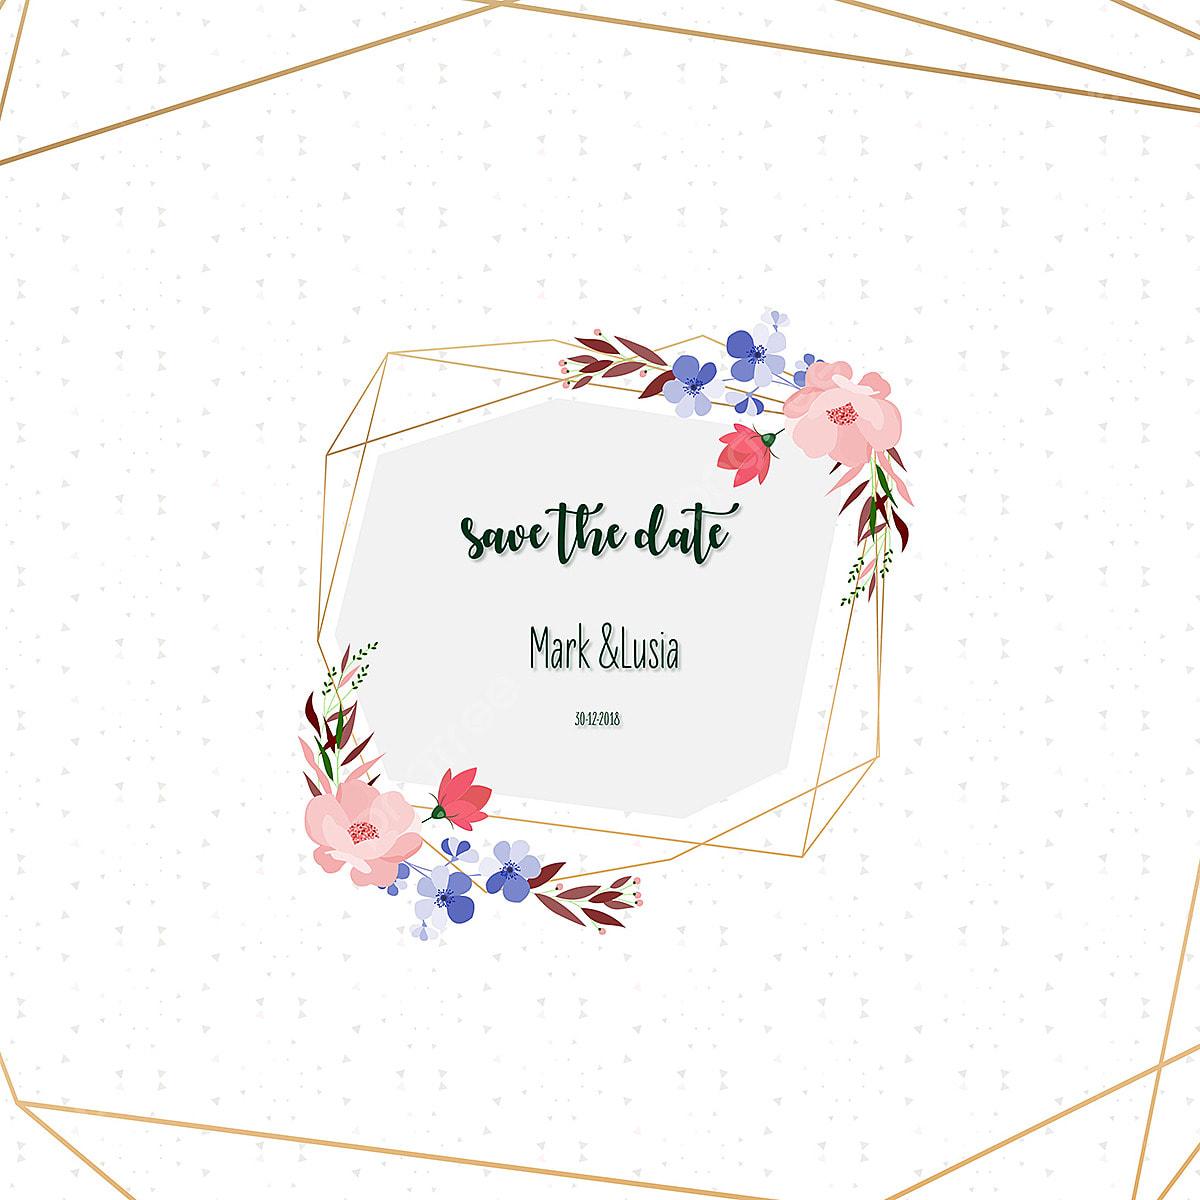 Elegant Wedding Invitation Card Wedding Card Weddinginvitation Cards Png And Vector With Transparent Background For Free Download